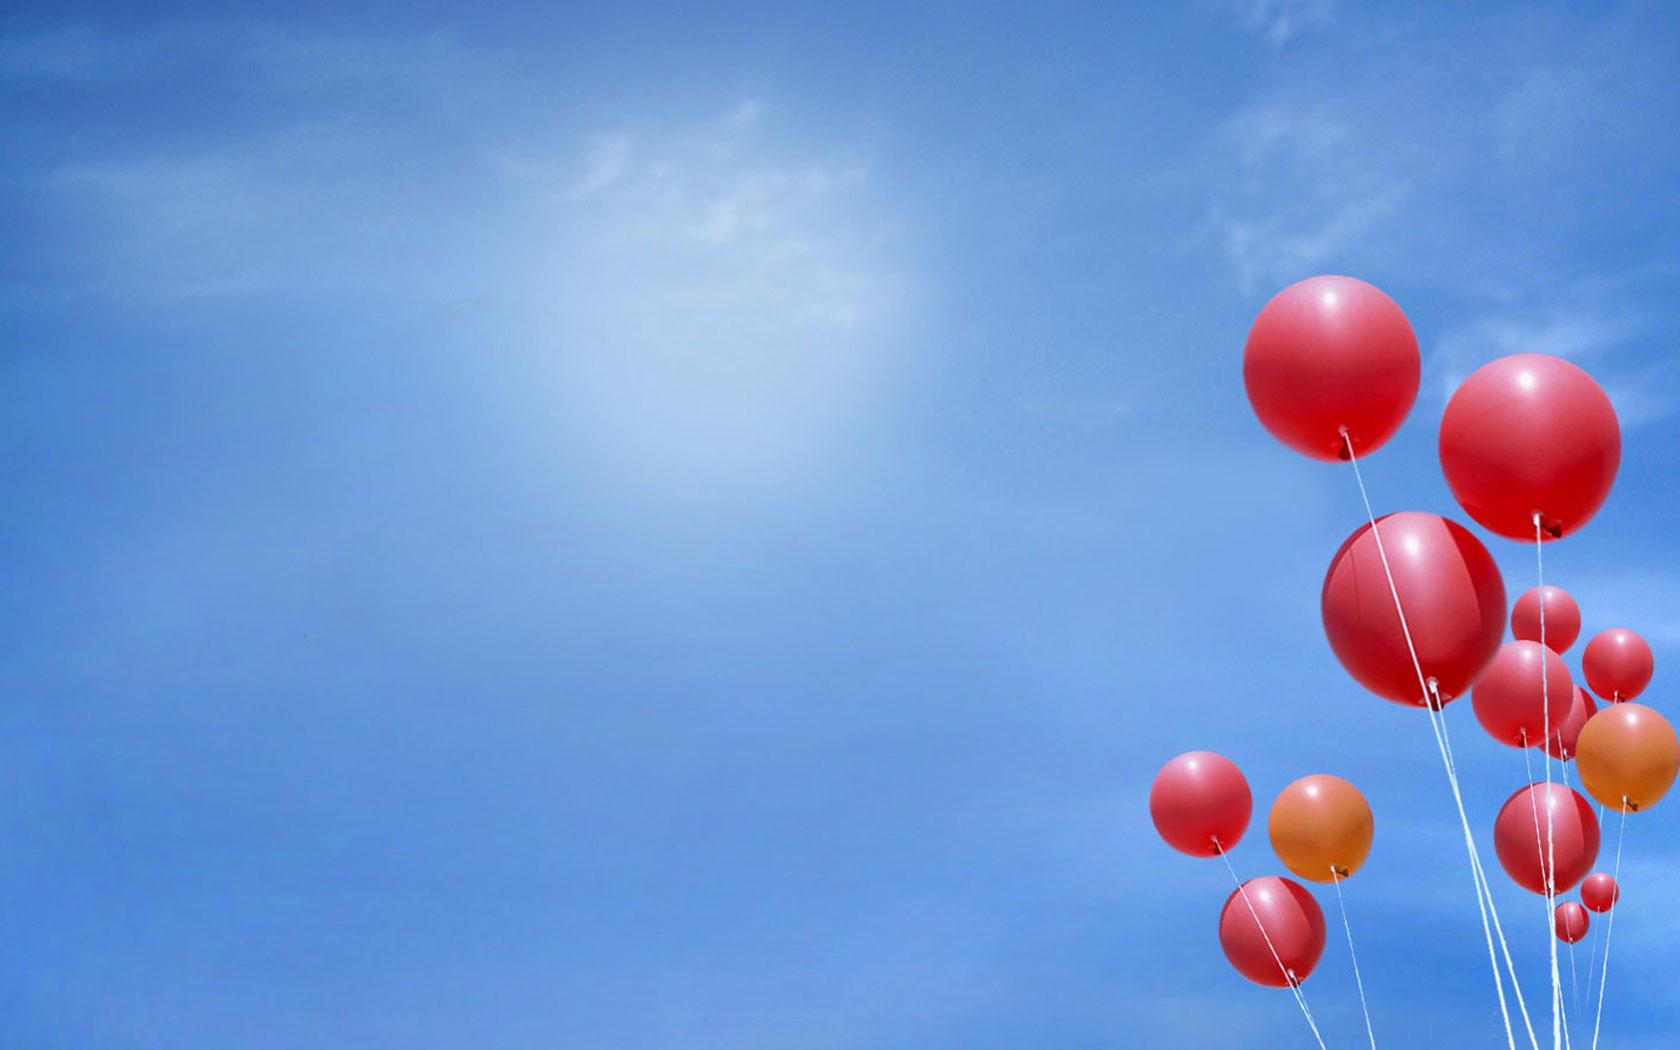 Balloons Wallpaper Desktop - WallpaperSafari